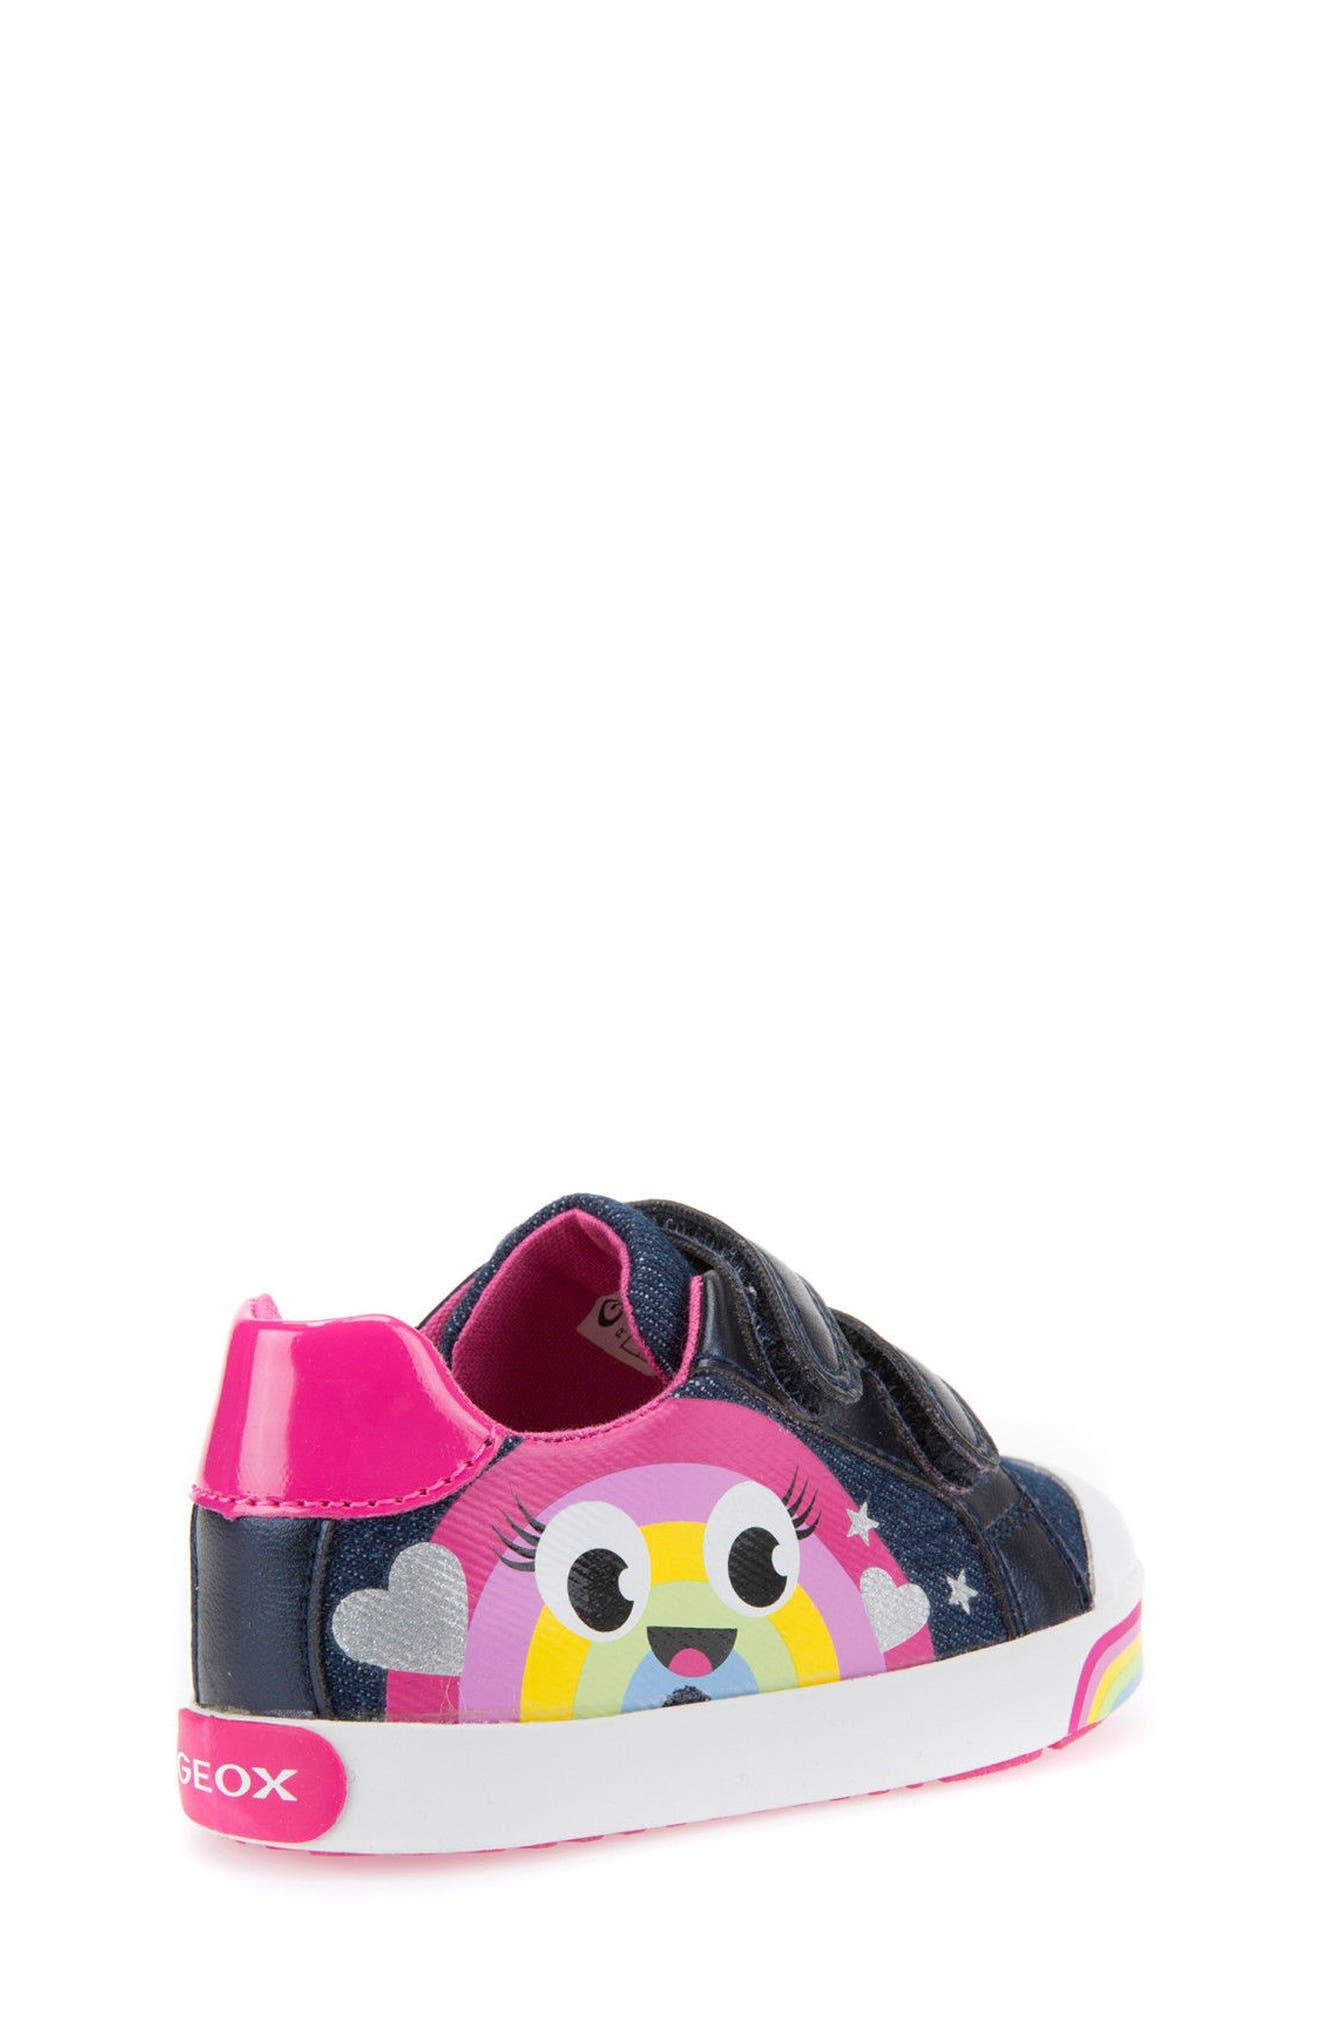 Kilwi Low Top Sneaker,                             Alternate thumbnail 2, color,                             Avio/ Multicolor